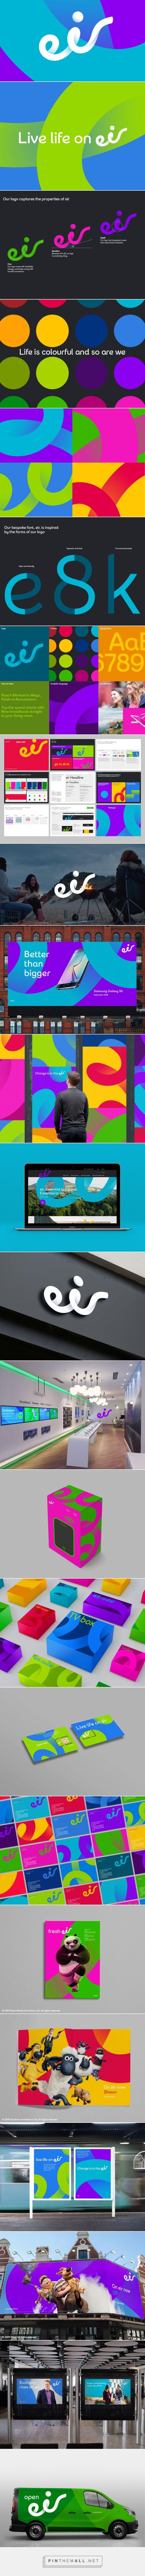 eir   Moving Brands